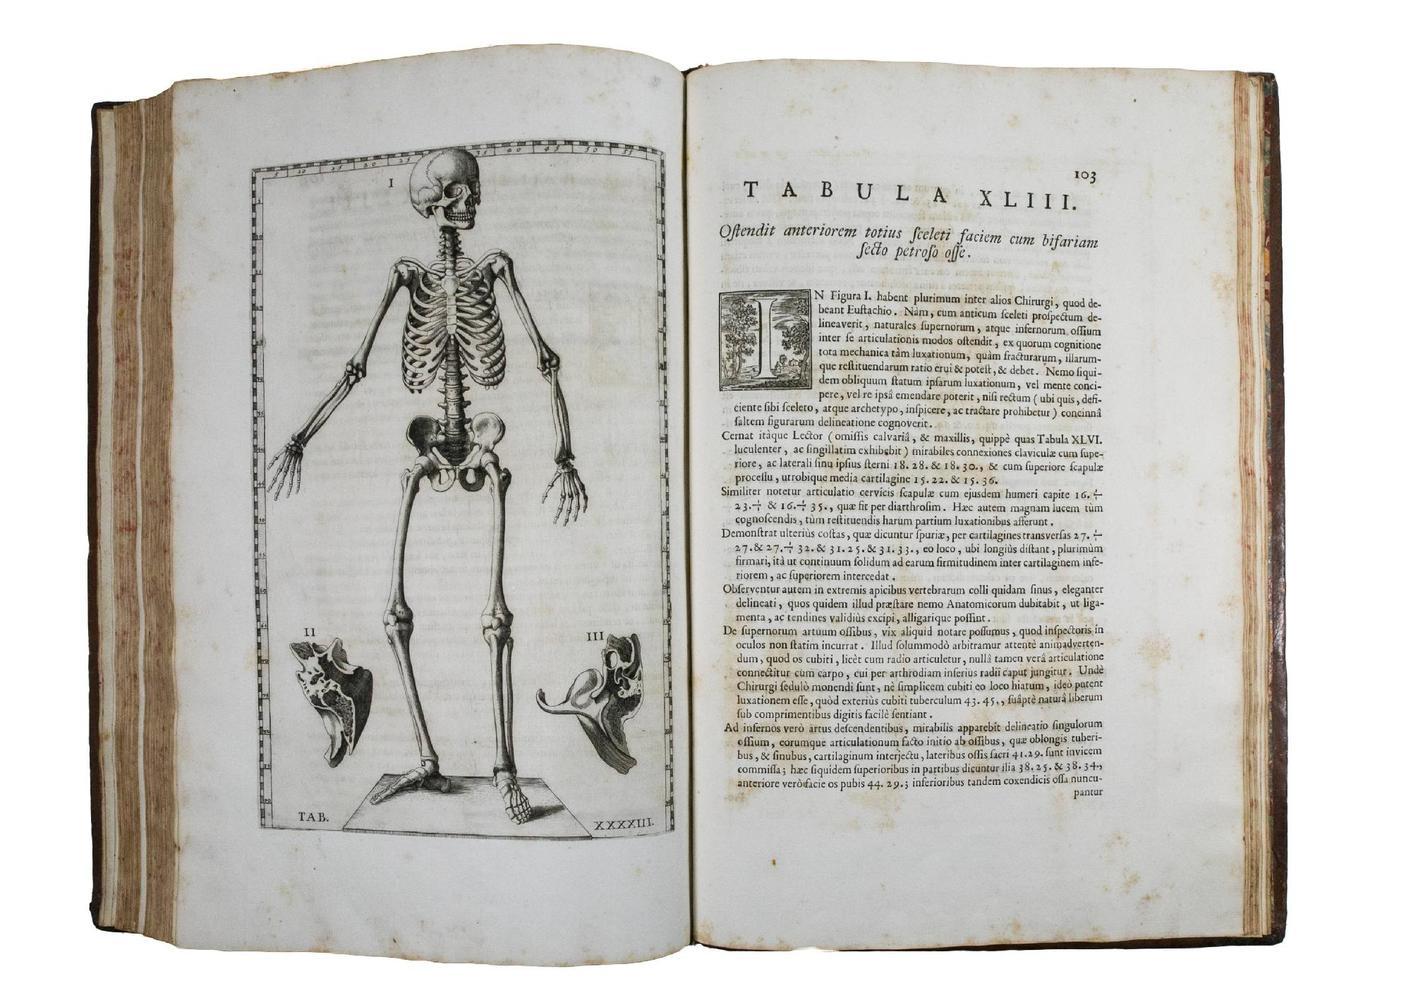 De vita libri tres (De triplici vita), Apologia, Quod